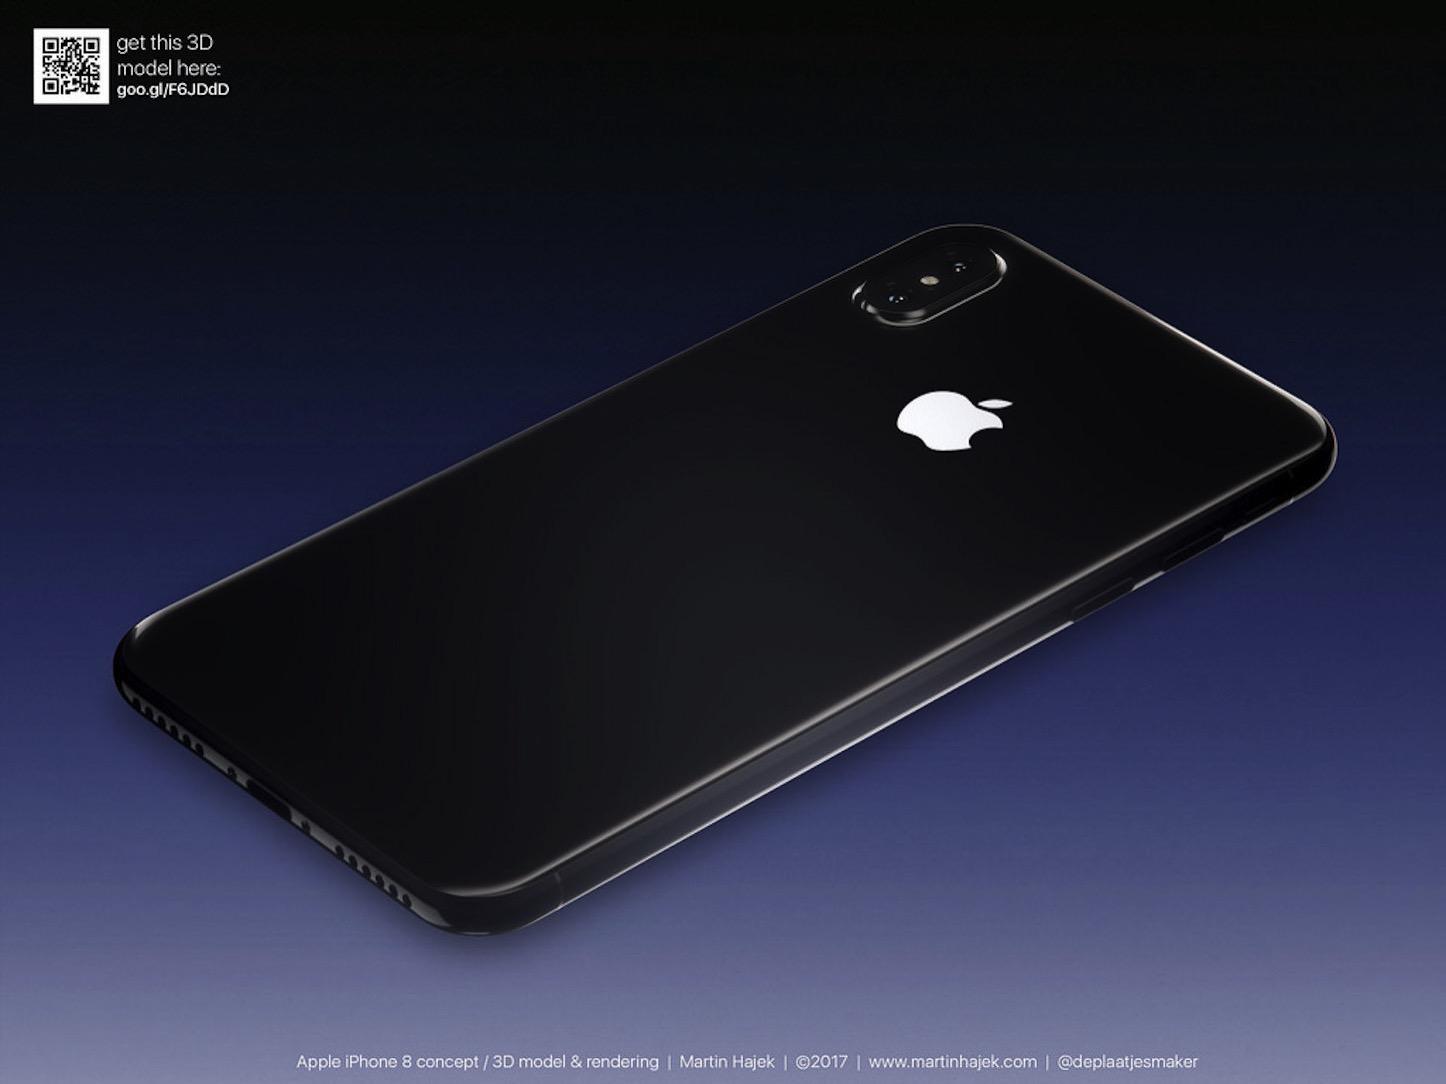 iPhone-Pro-8-Martin-Hajek-Reders-1.jpg